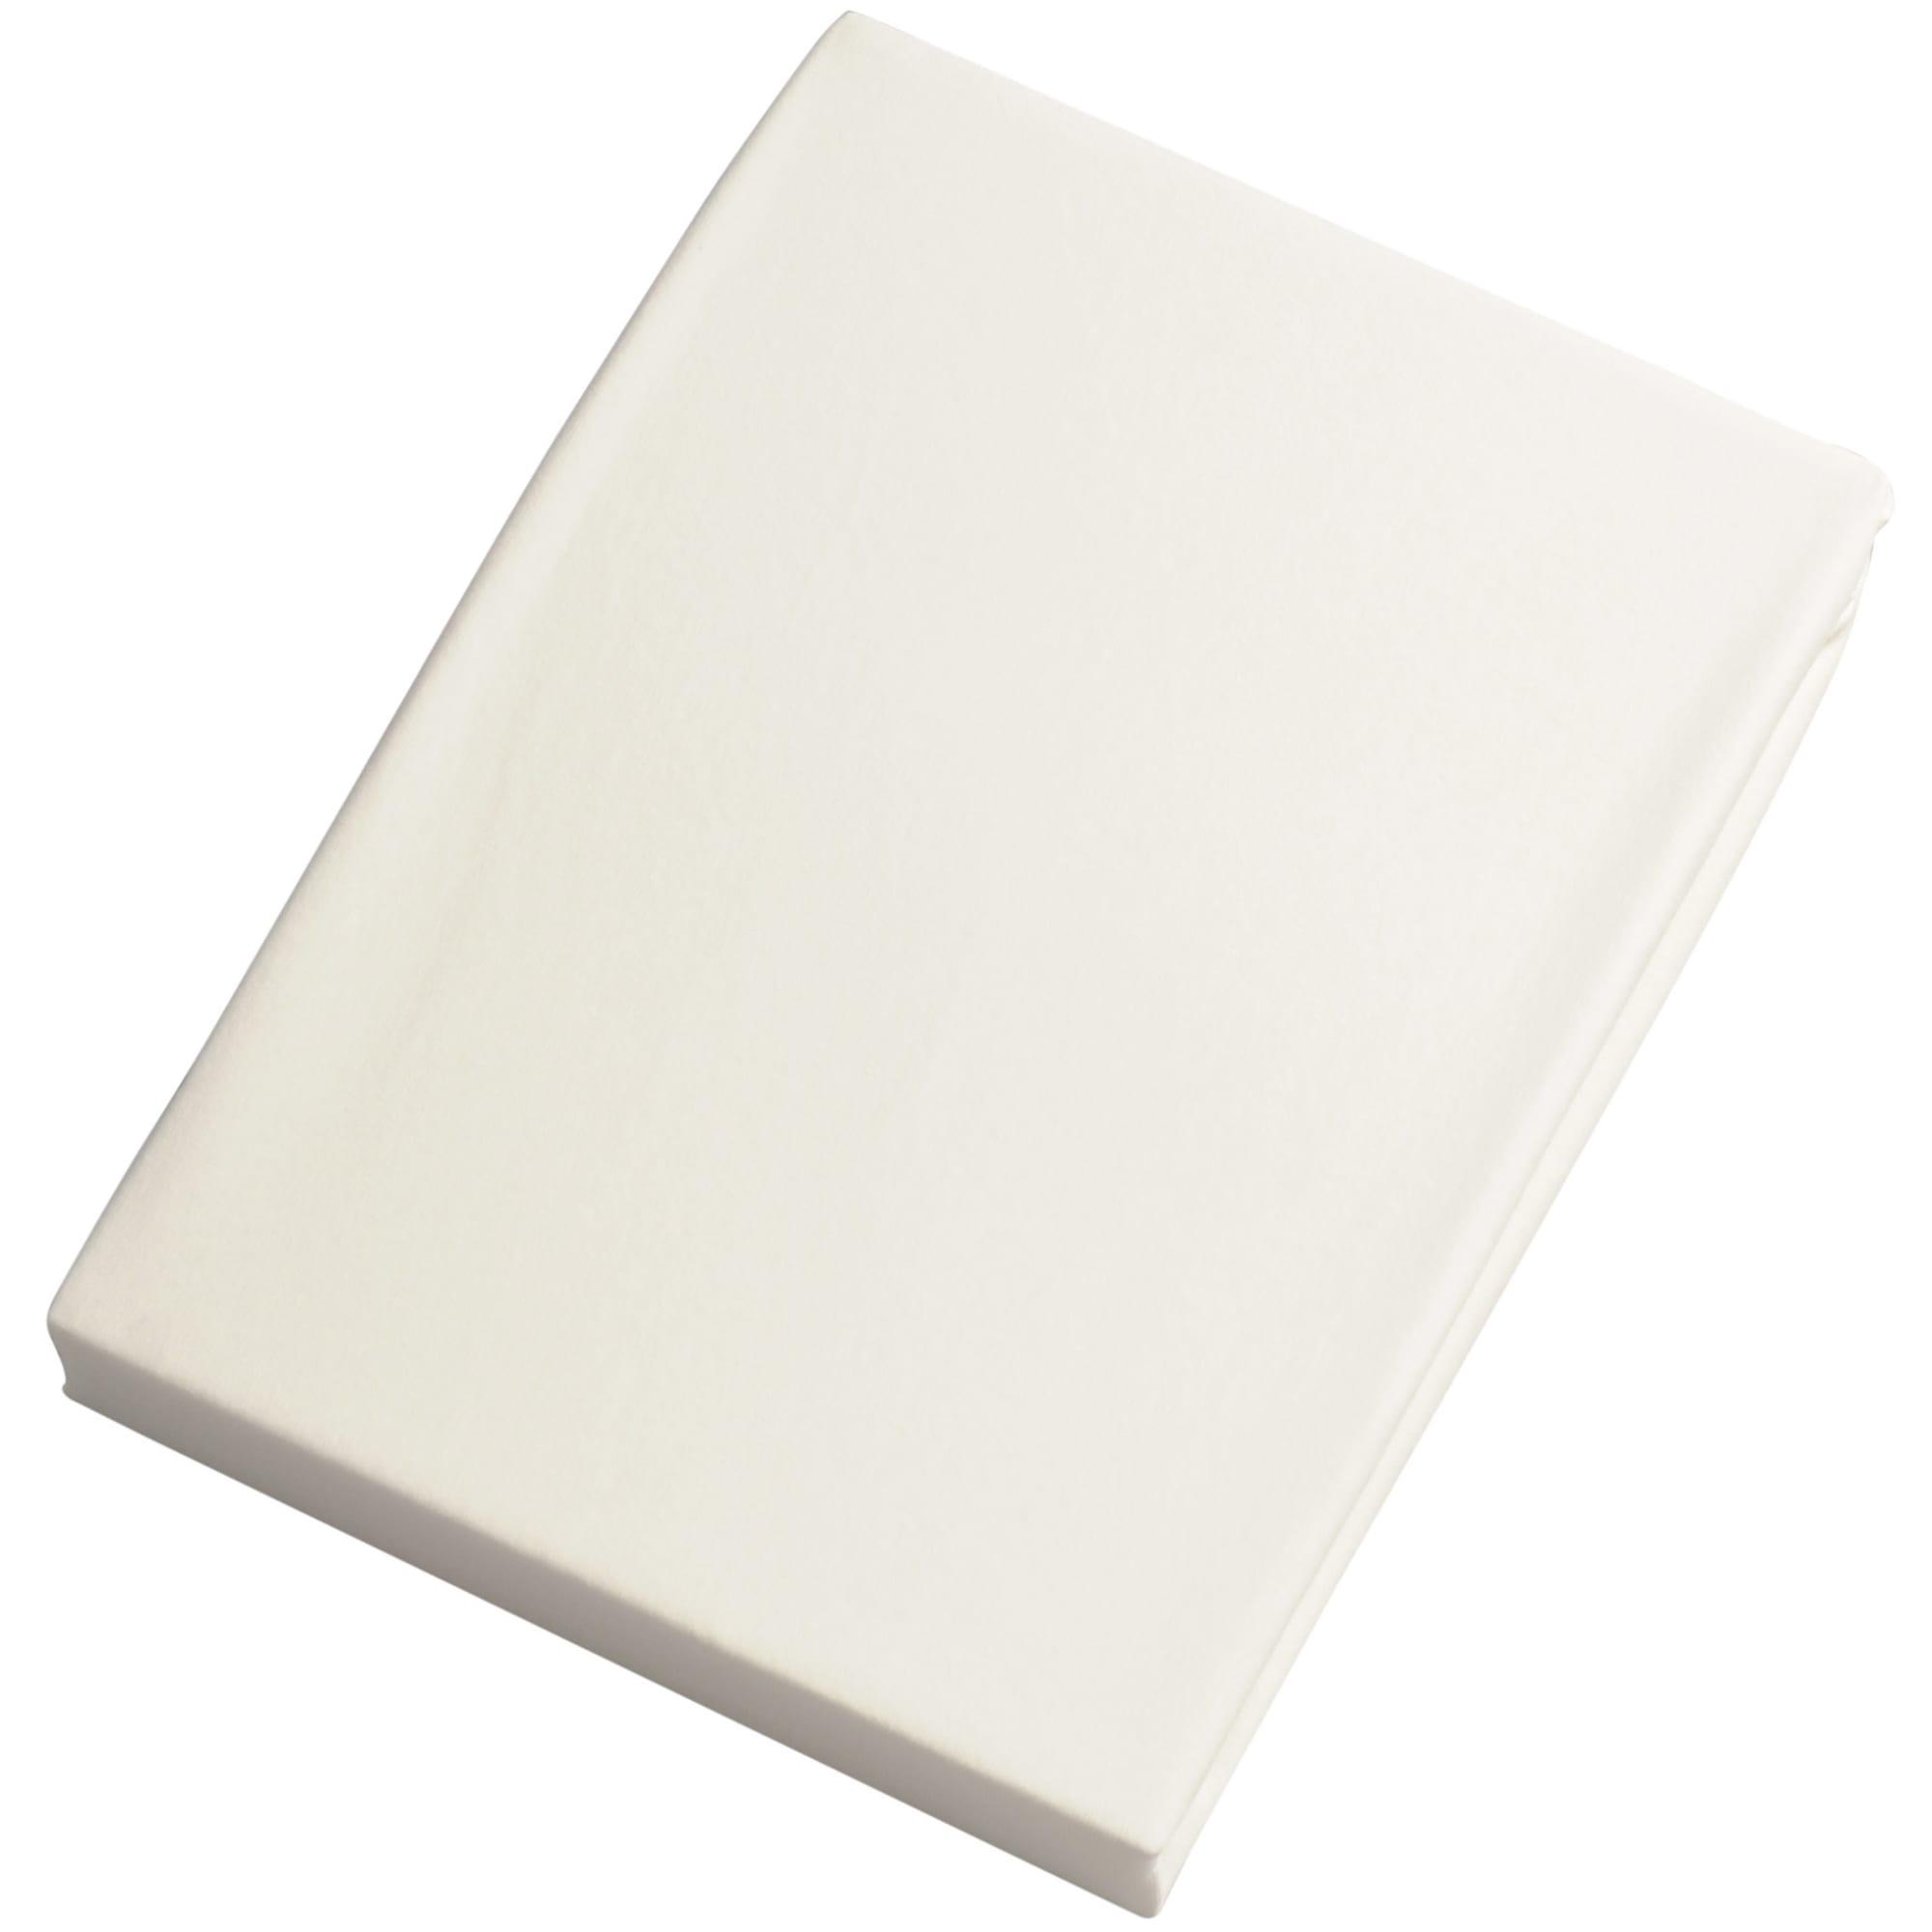 Bomuld/elastan - 90 x 200 x 27 cm